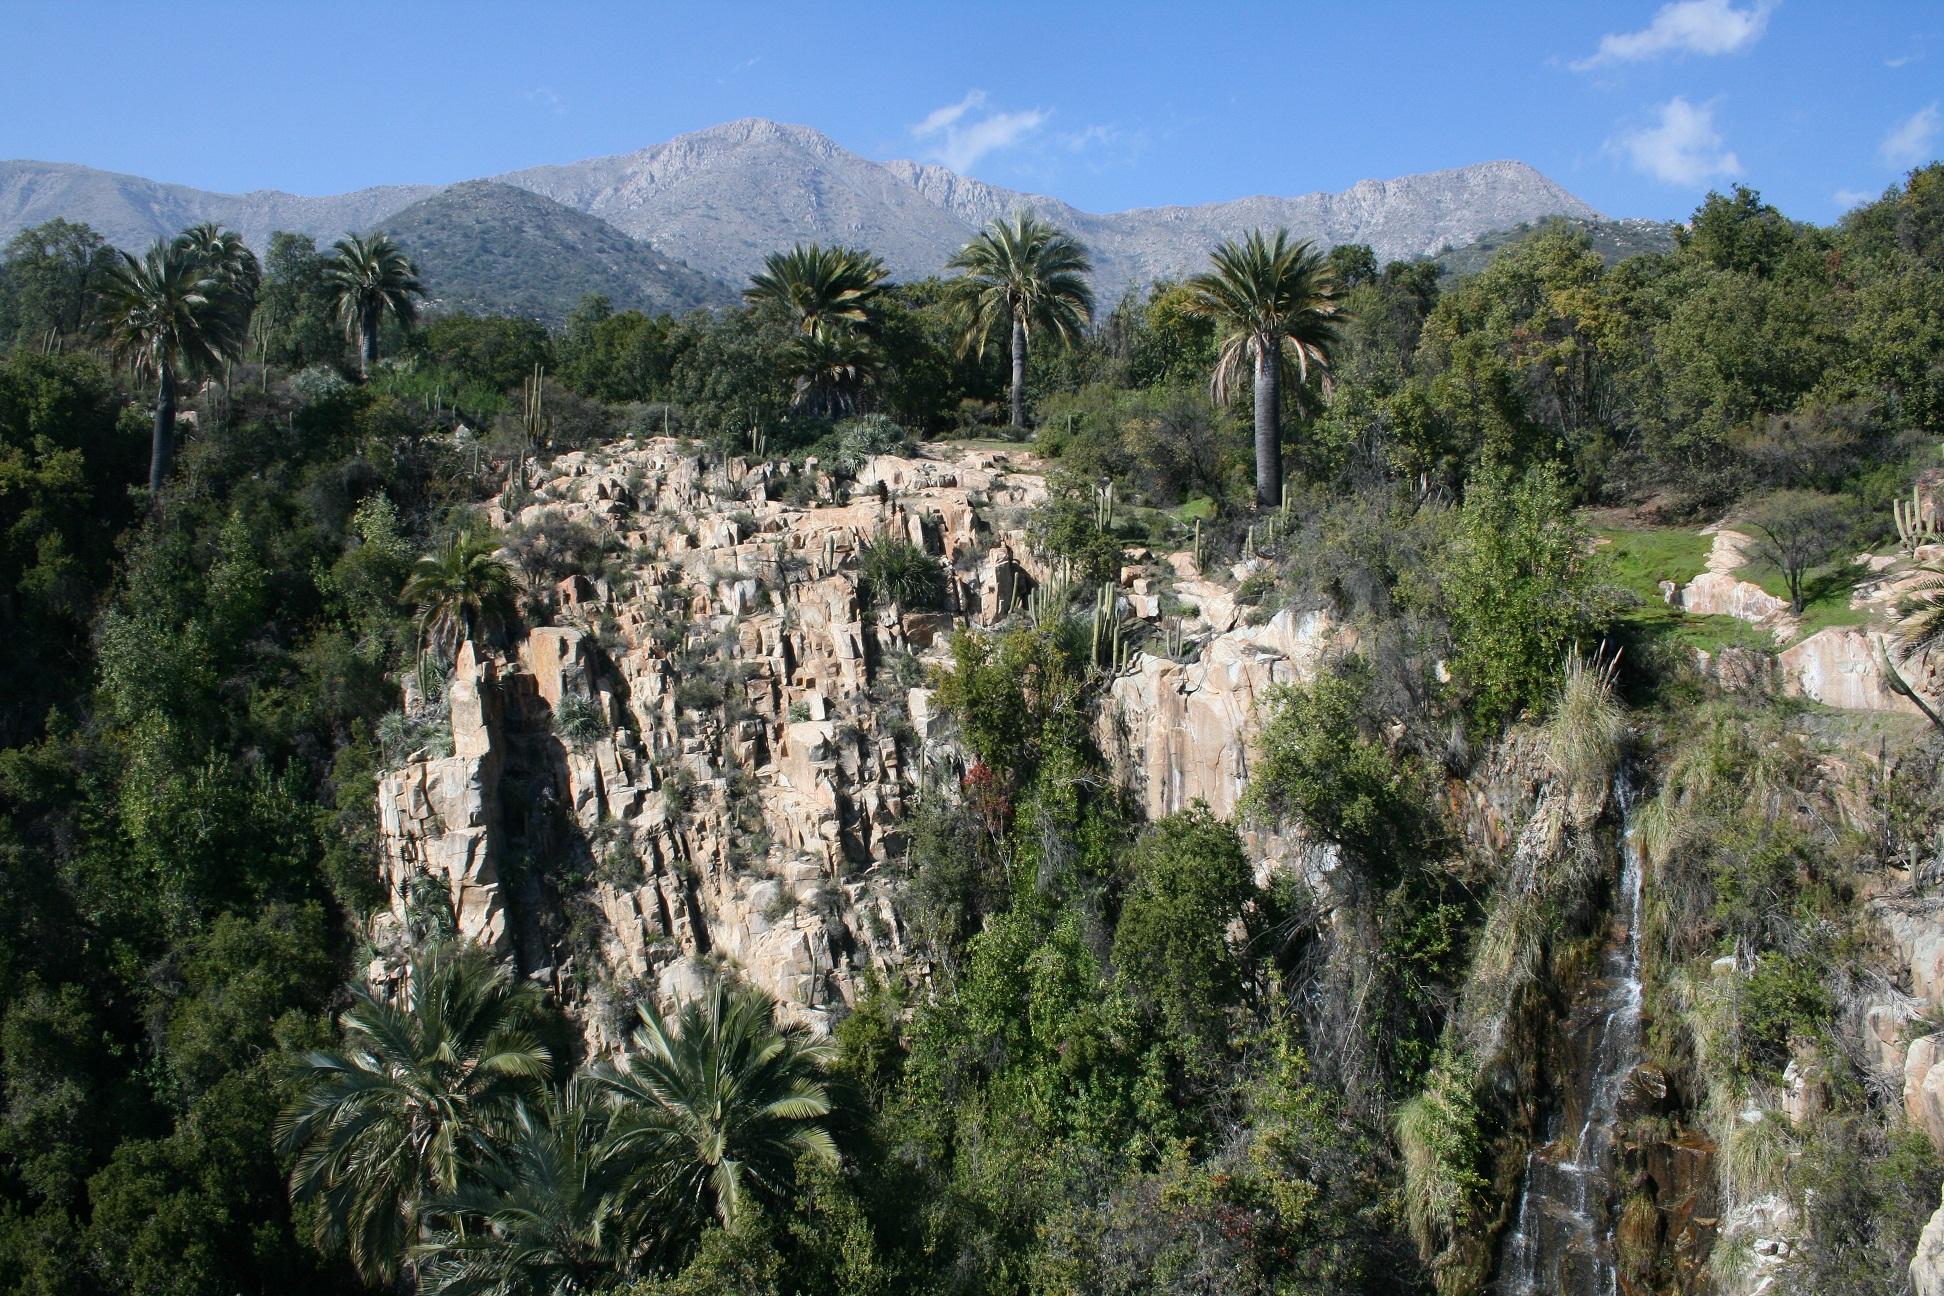 Parque nacional la campana cascada